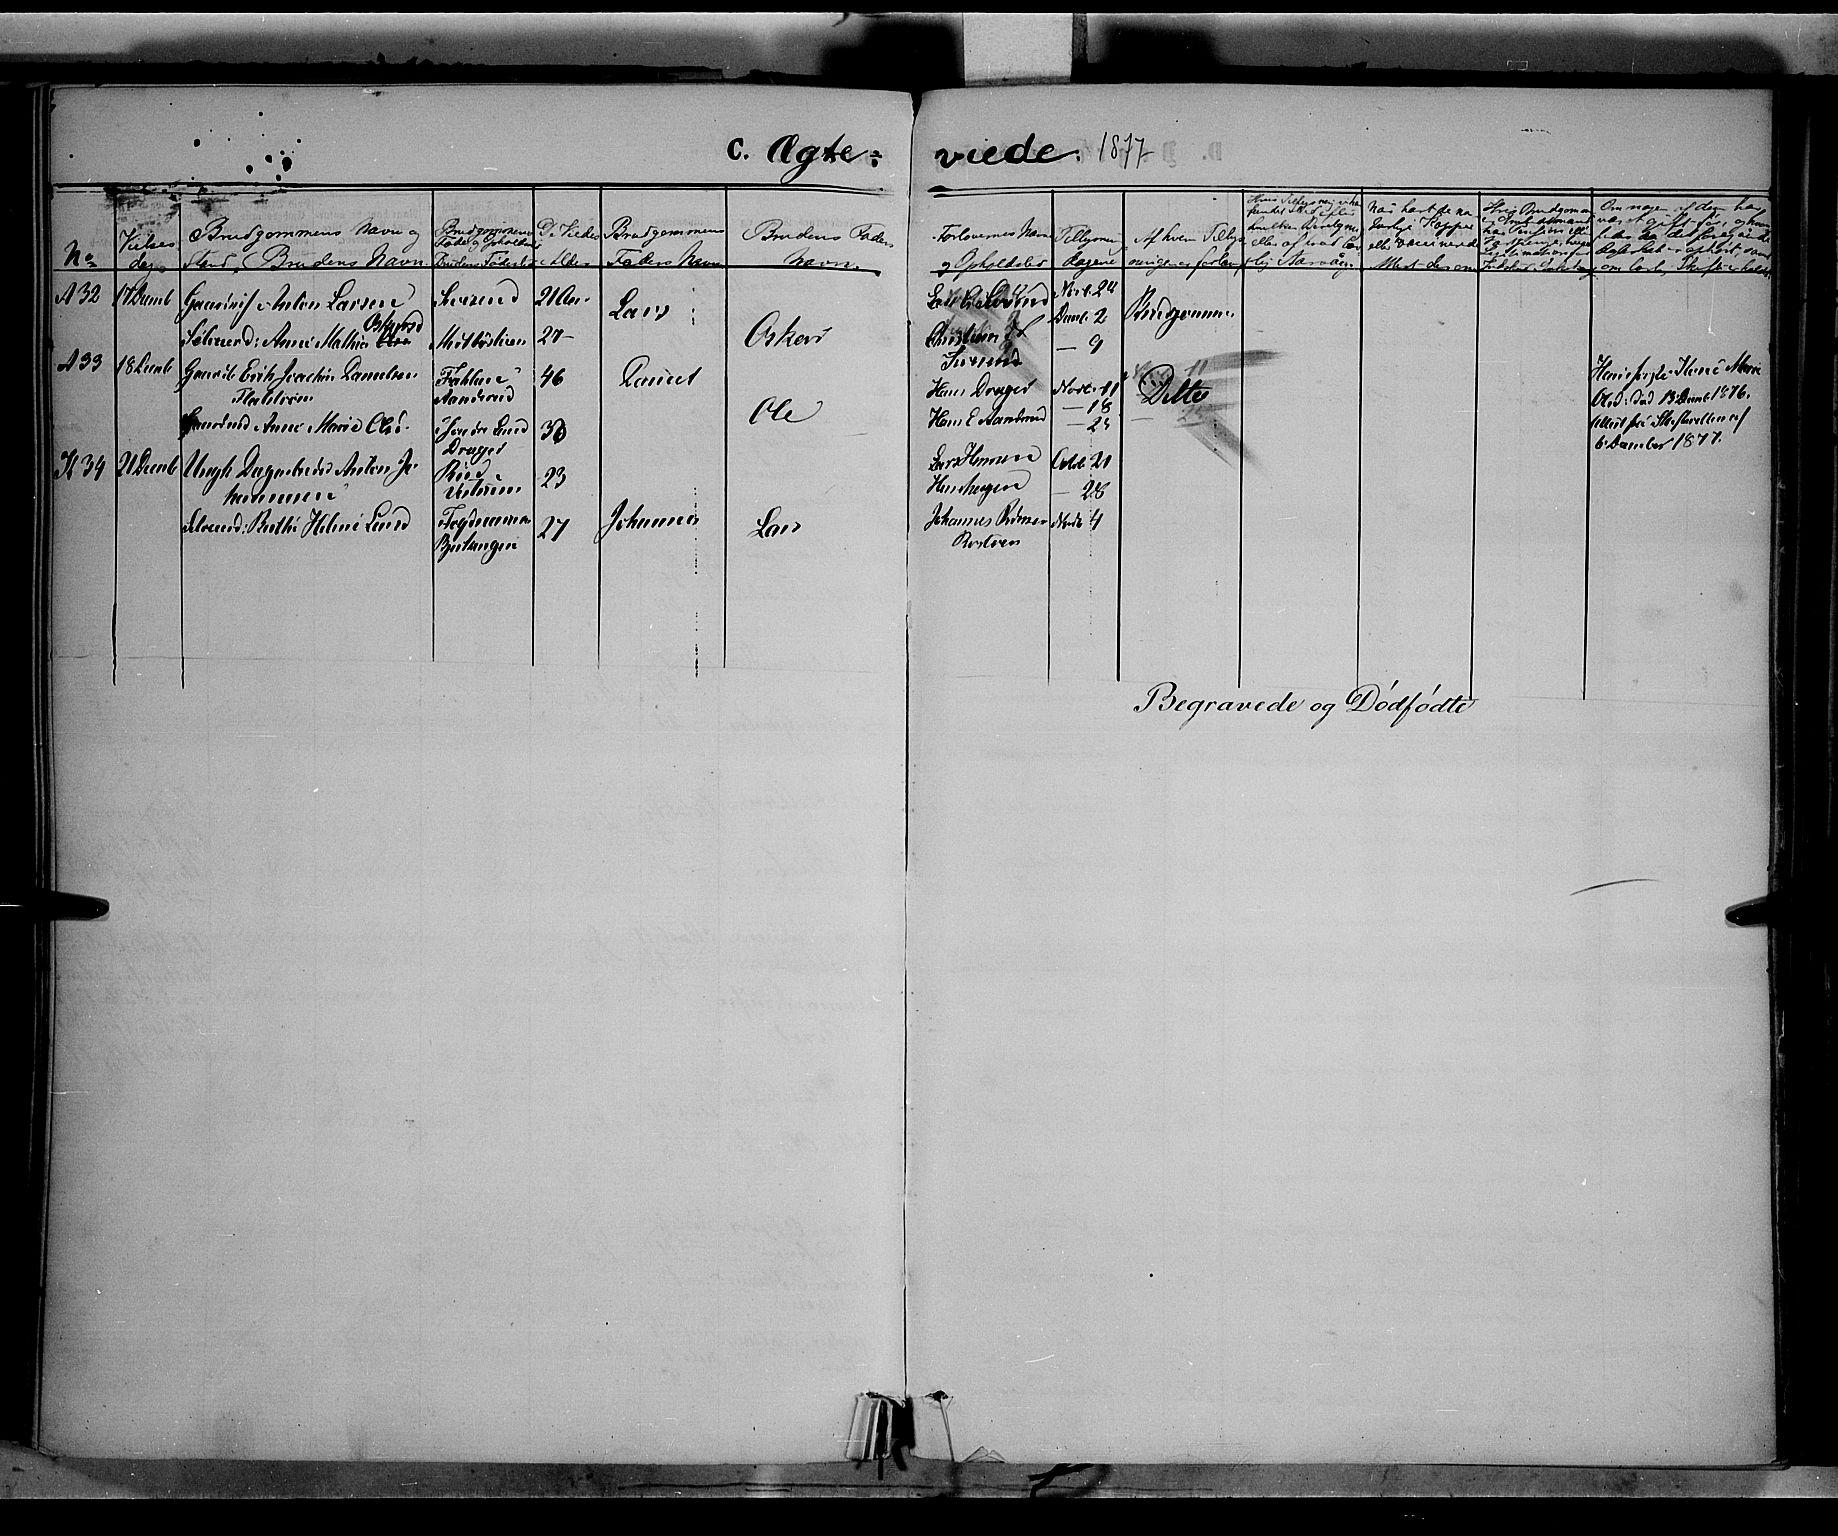 SAH, Vestre Toten prestekontor, Ministerialbok nr. 8, 1870-1877